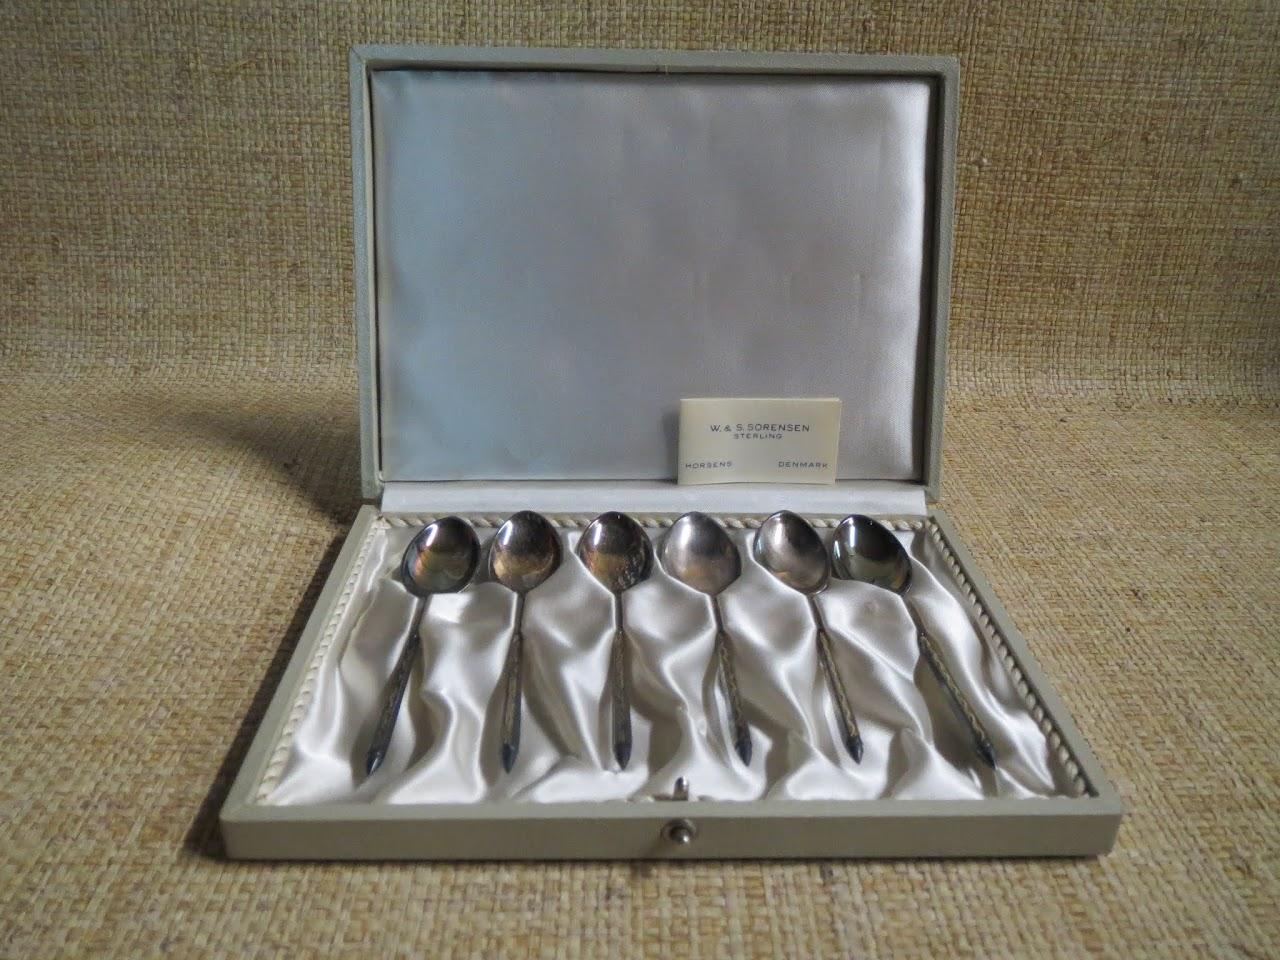 W. & S. Sorensen Sterling Silver Spoon Set